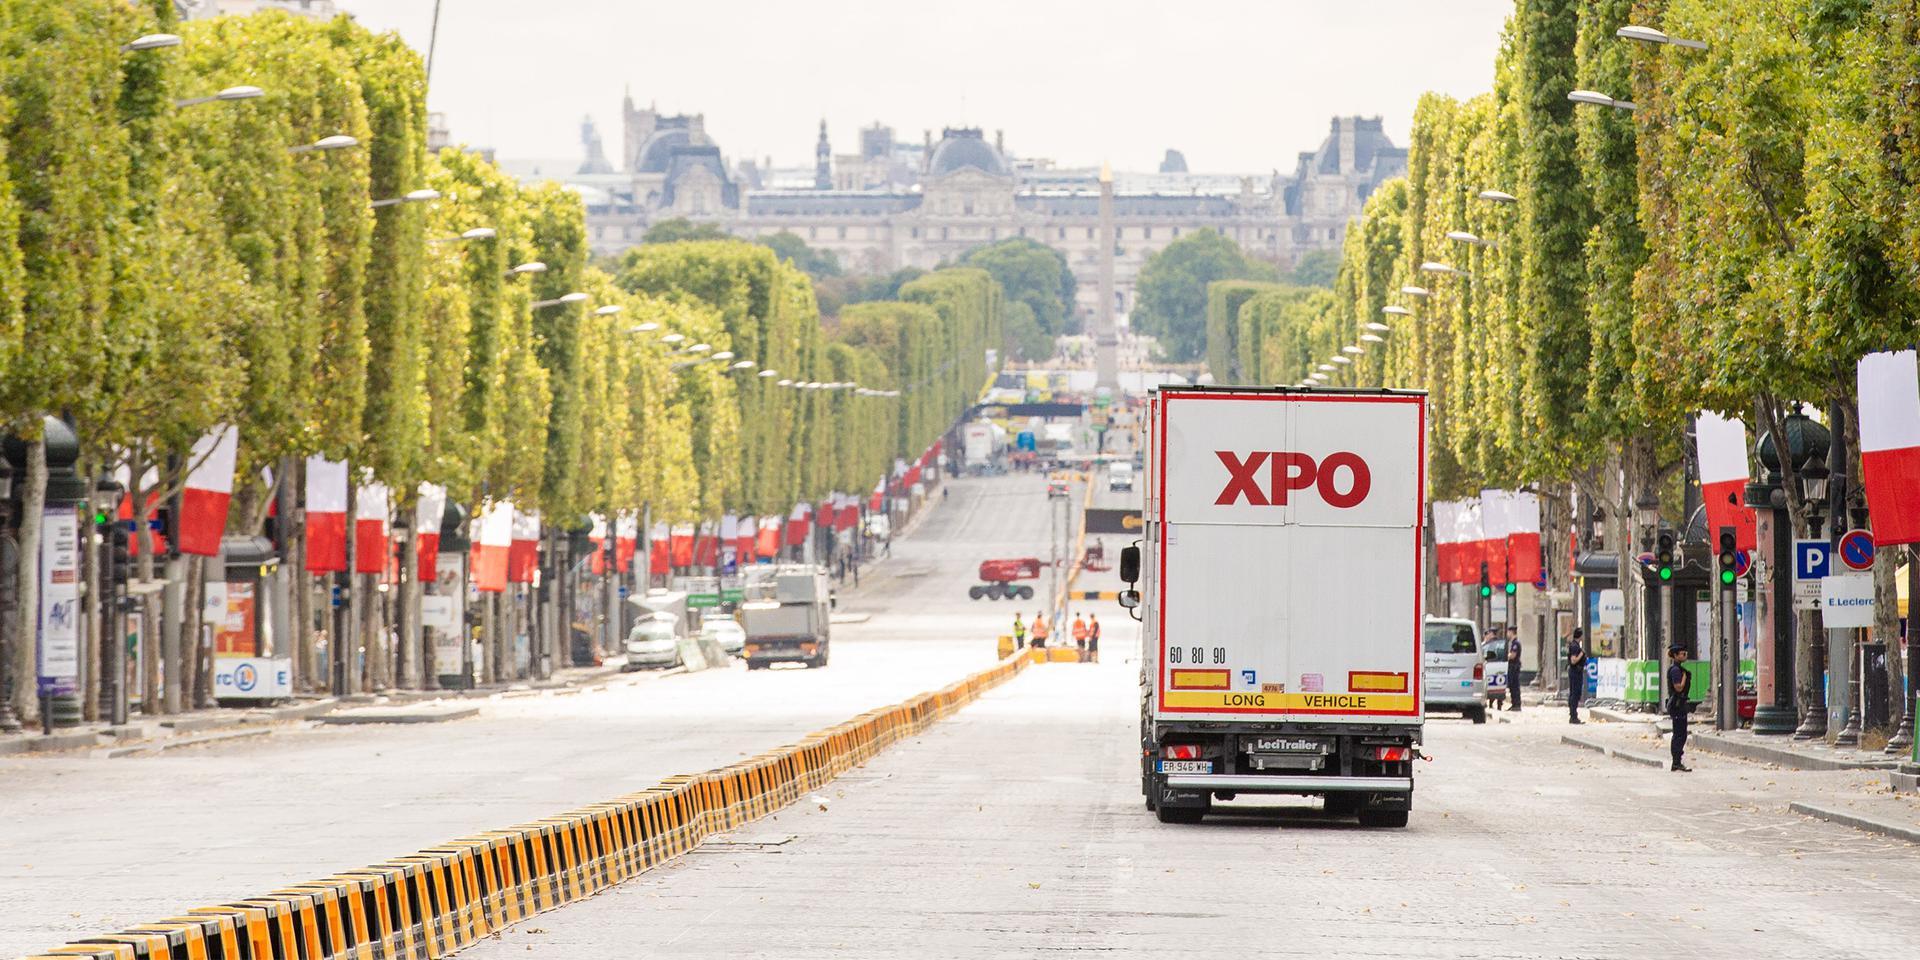 XPO event transportation